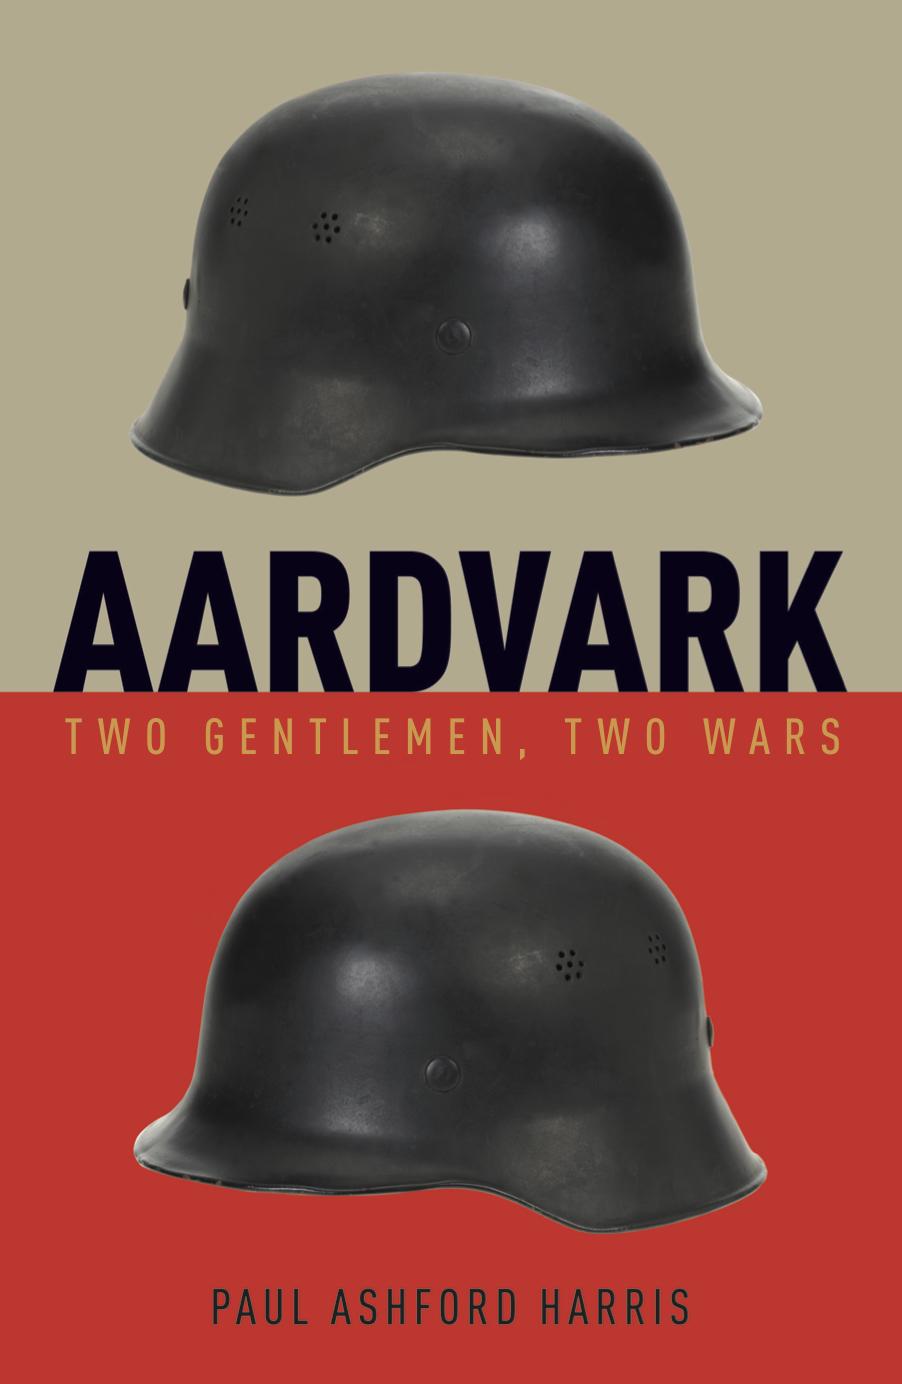 Aardvark_Cover Artwork.jpg